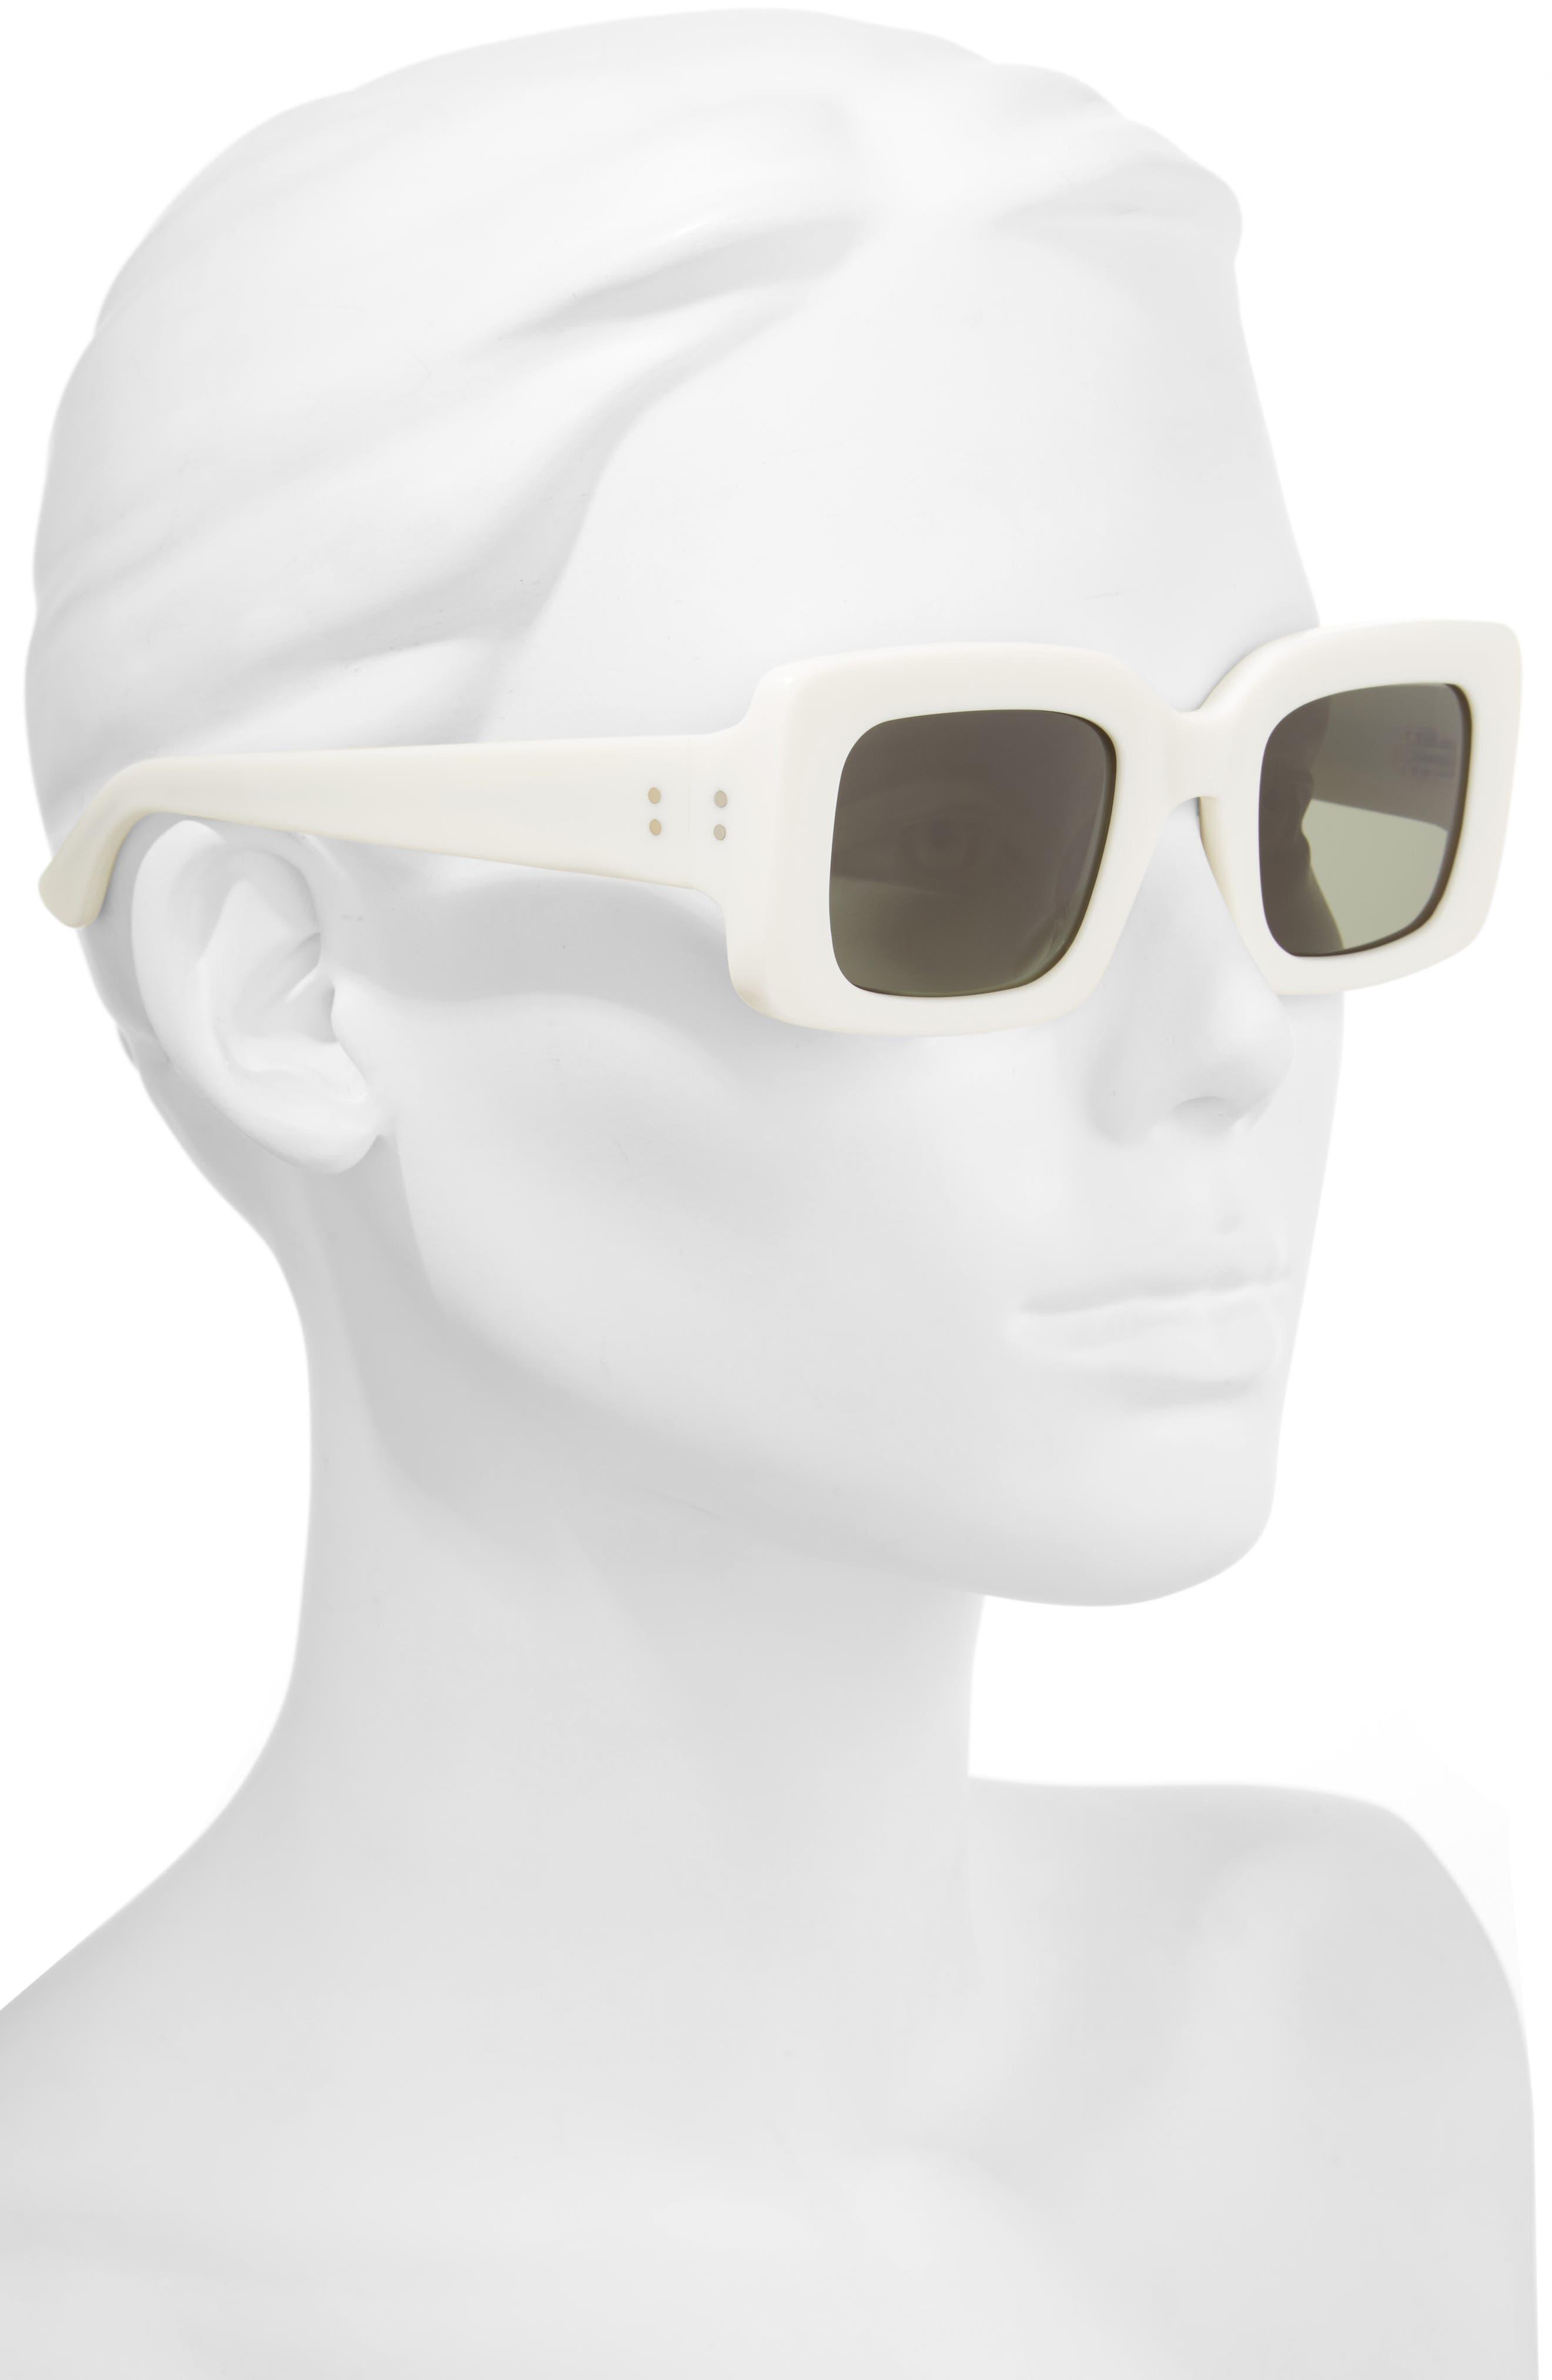 x Alex Knost Luxury Wig Flatscreen 49mm Square Sunglasses,                             Alternate thumbnail 2, color,                             PEROXIDE